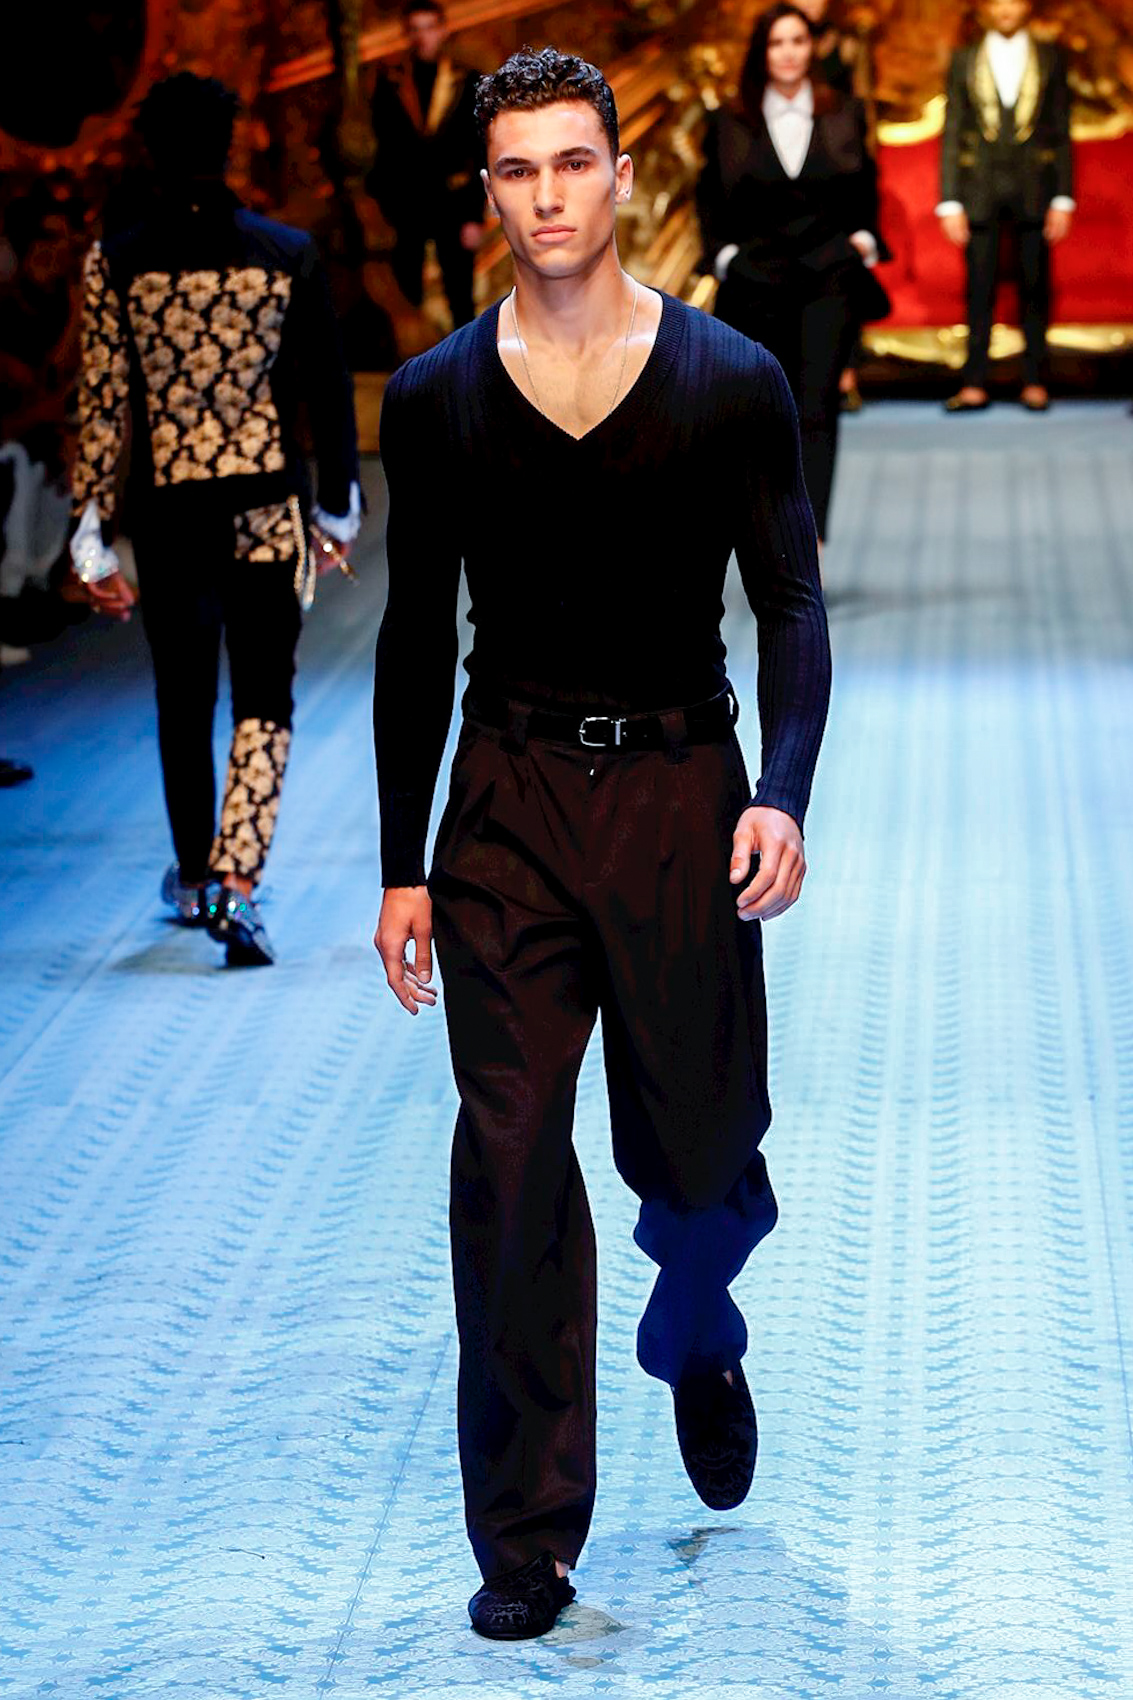 fbc3169cc12 This original supermodel closed the Dolce   Gabbana Men s SS19 Show